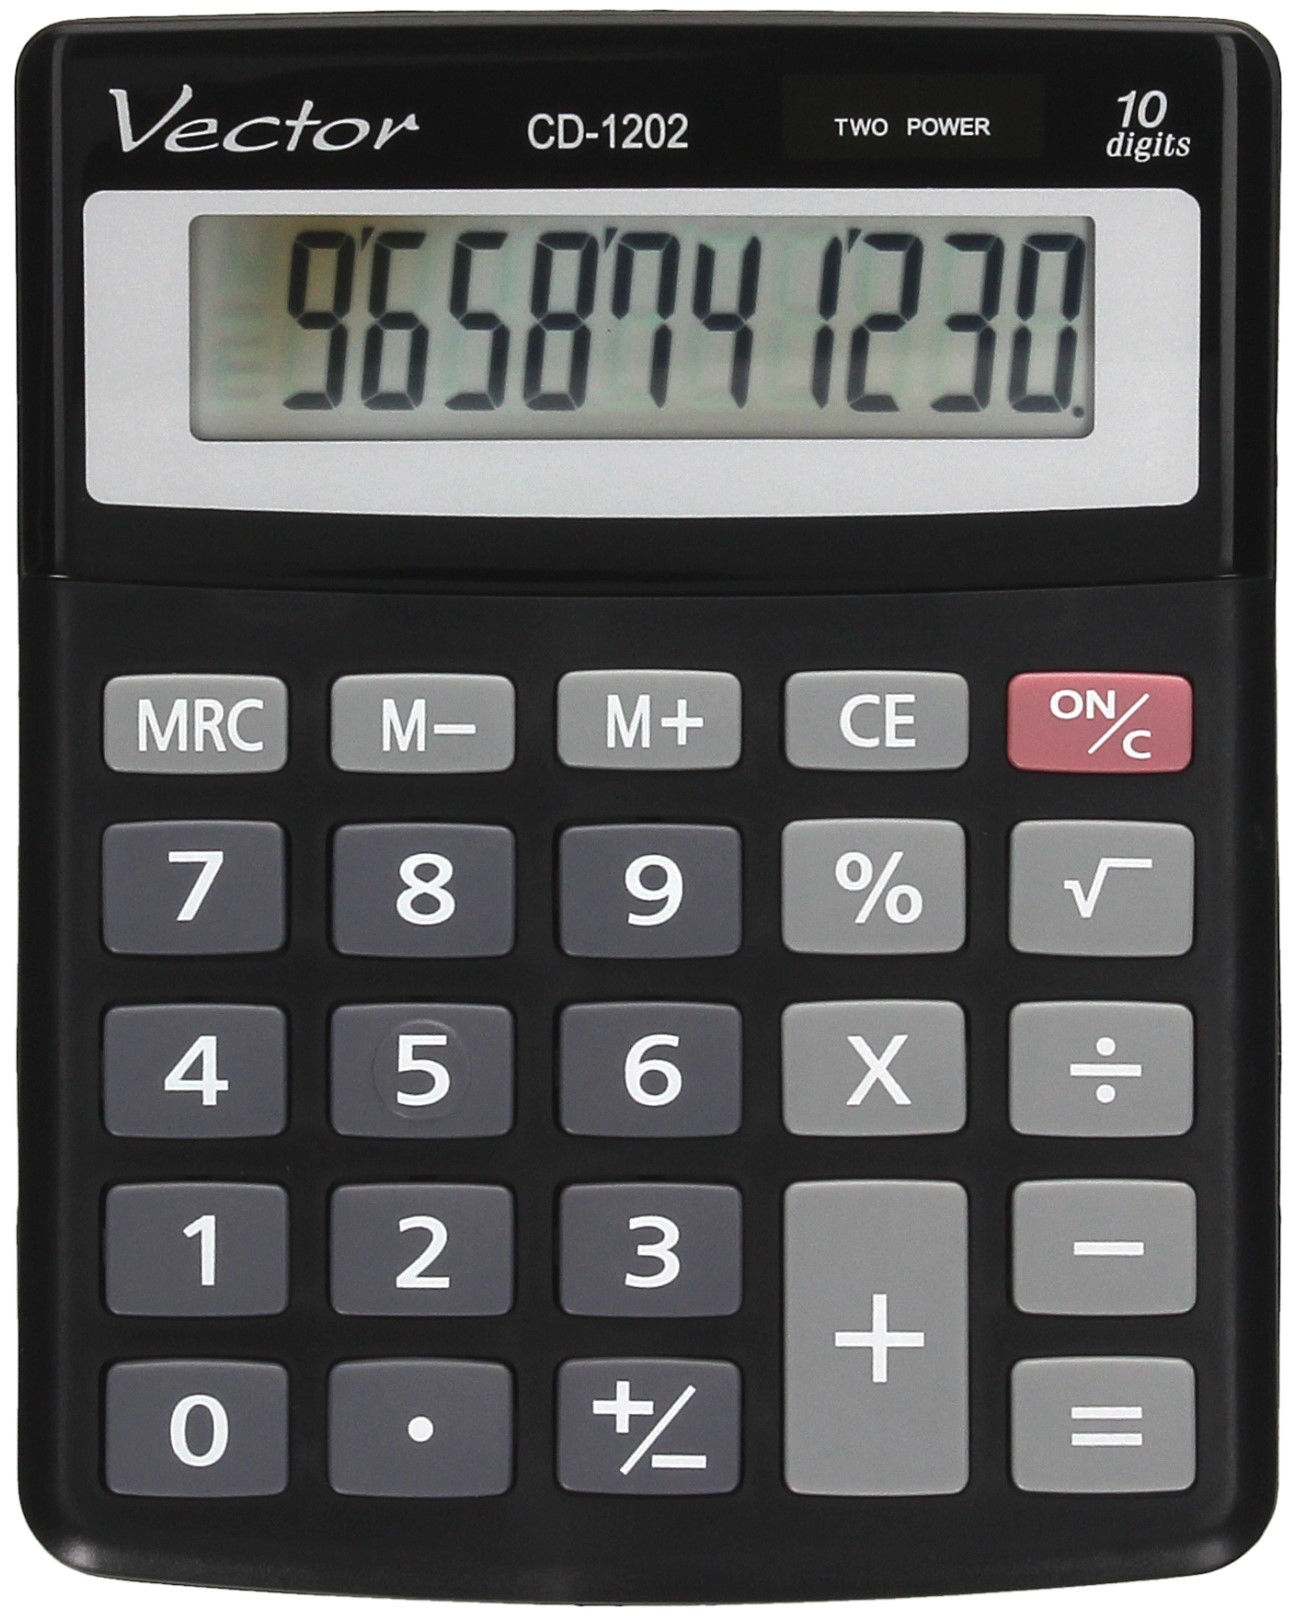 Kalkulator 10pozycyjny CD1202 Vector